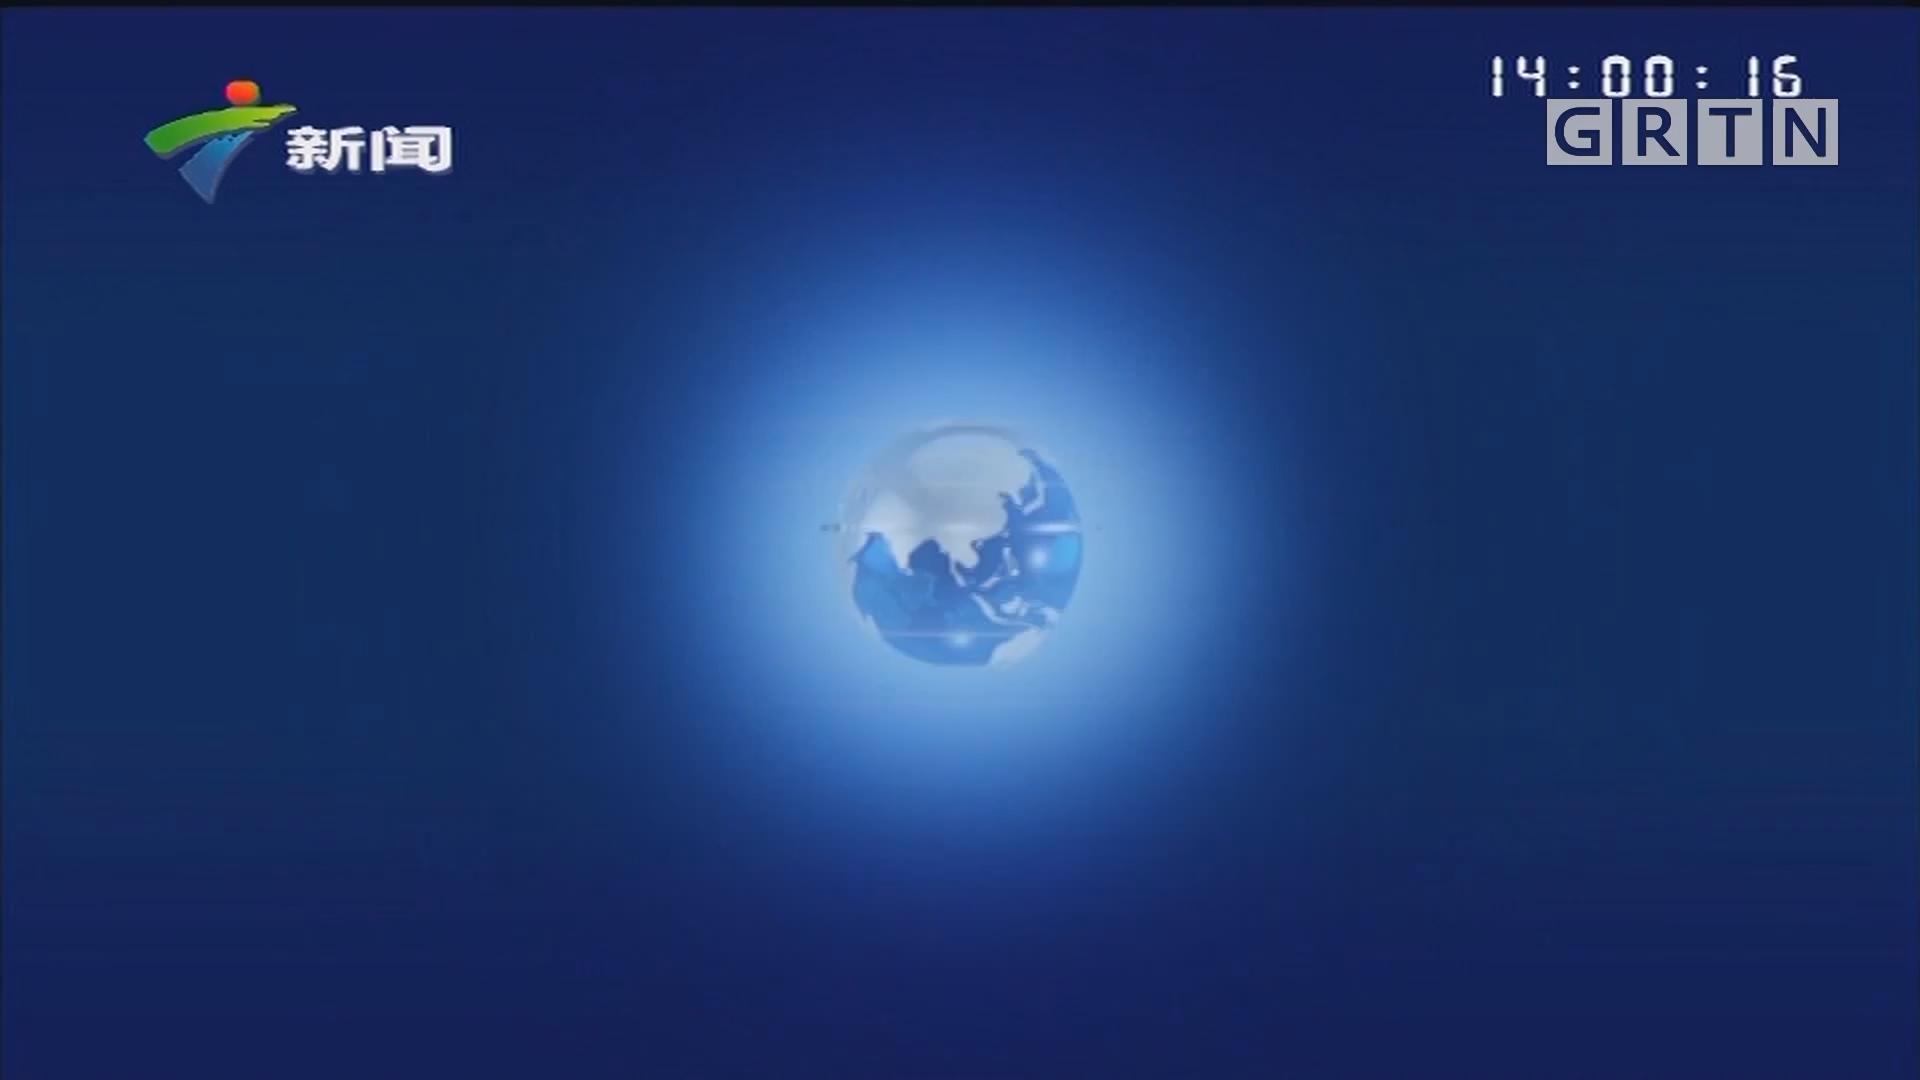 [HD][2019-12-06-14:00]正点播报:潮州 气象部门发射16枚增雨弹缓解旱情